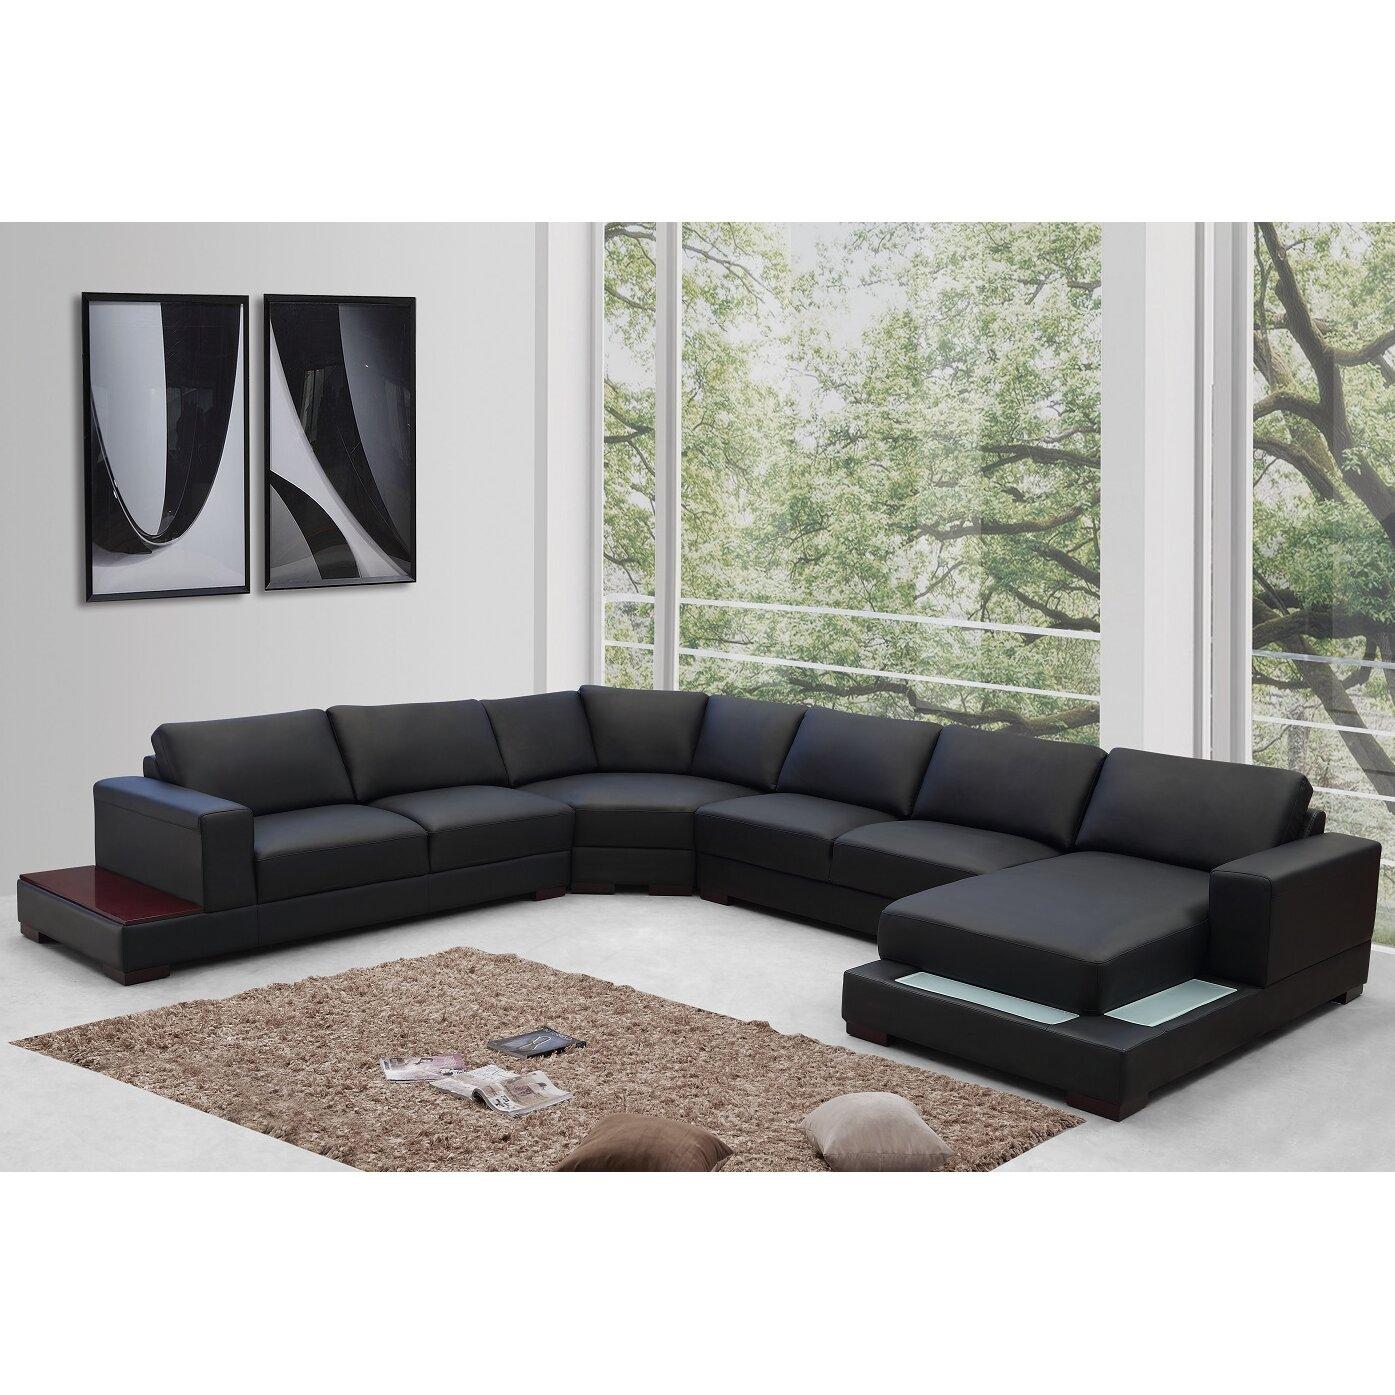 Hokku designs nelson sectional for Hokku designs living room furniture